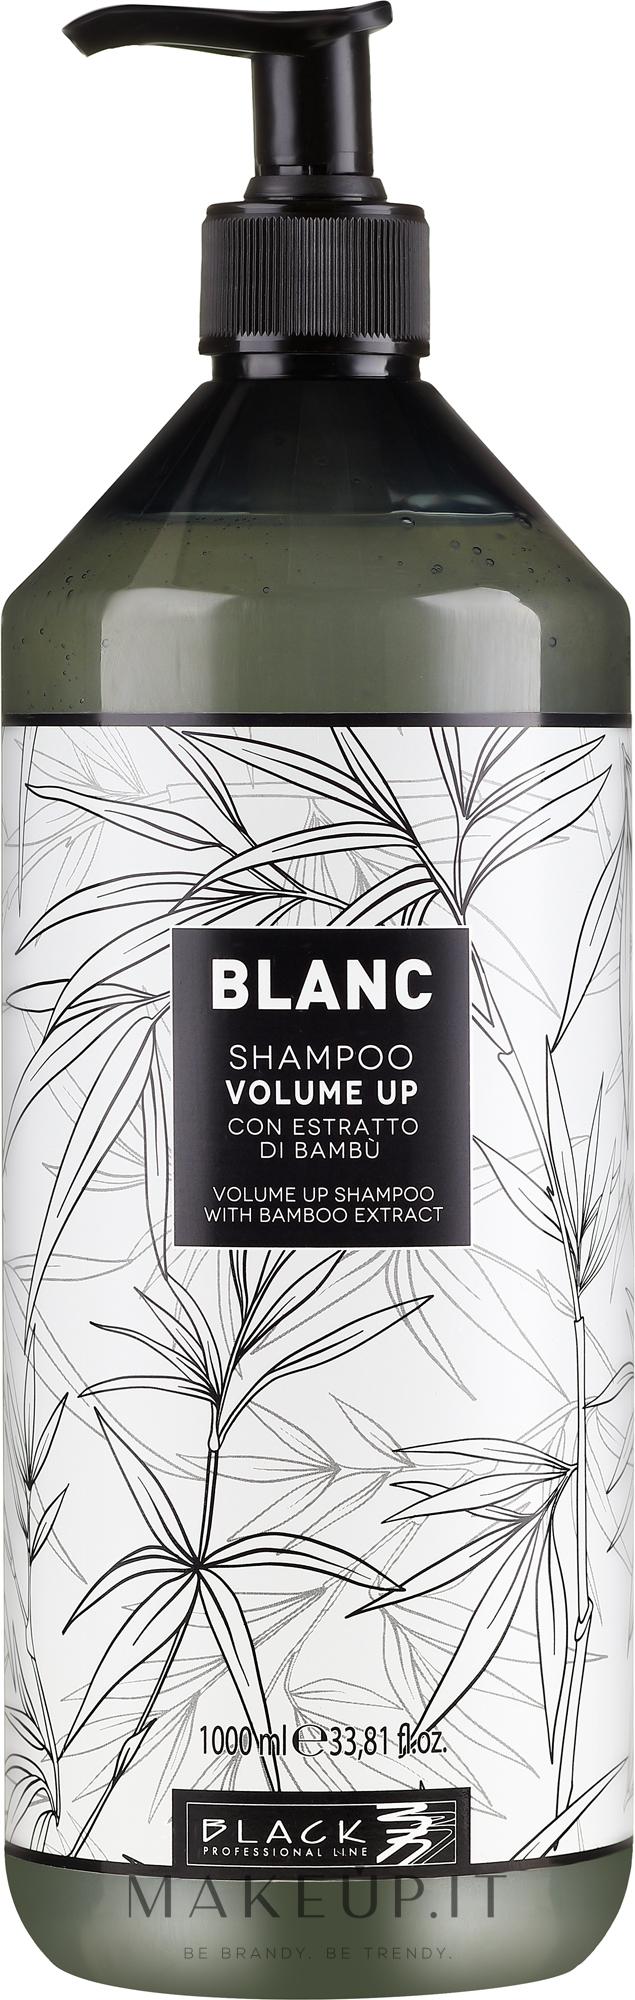 Shampoo per volume dei capelli - Black Professional Line Blanc Volume Up Shampoo — foto 1000 ml